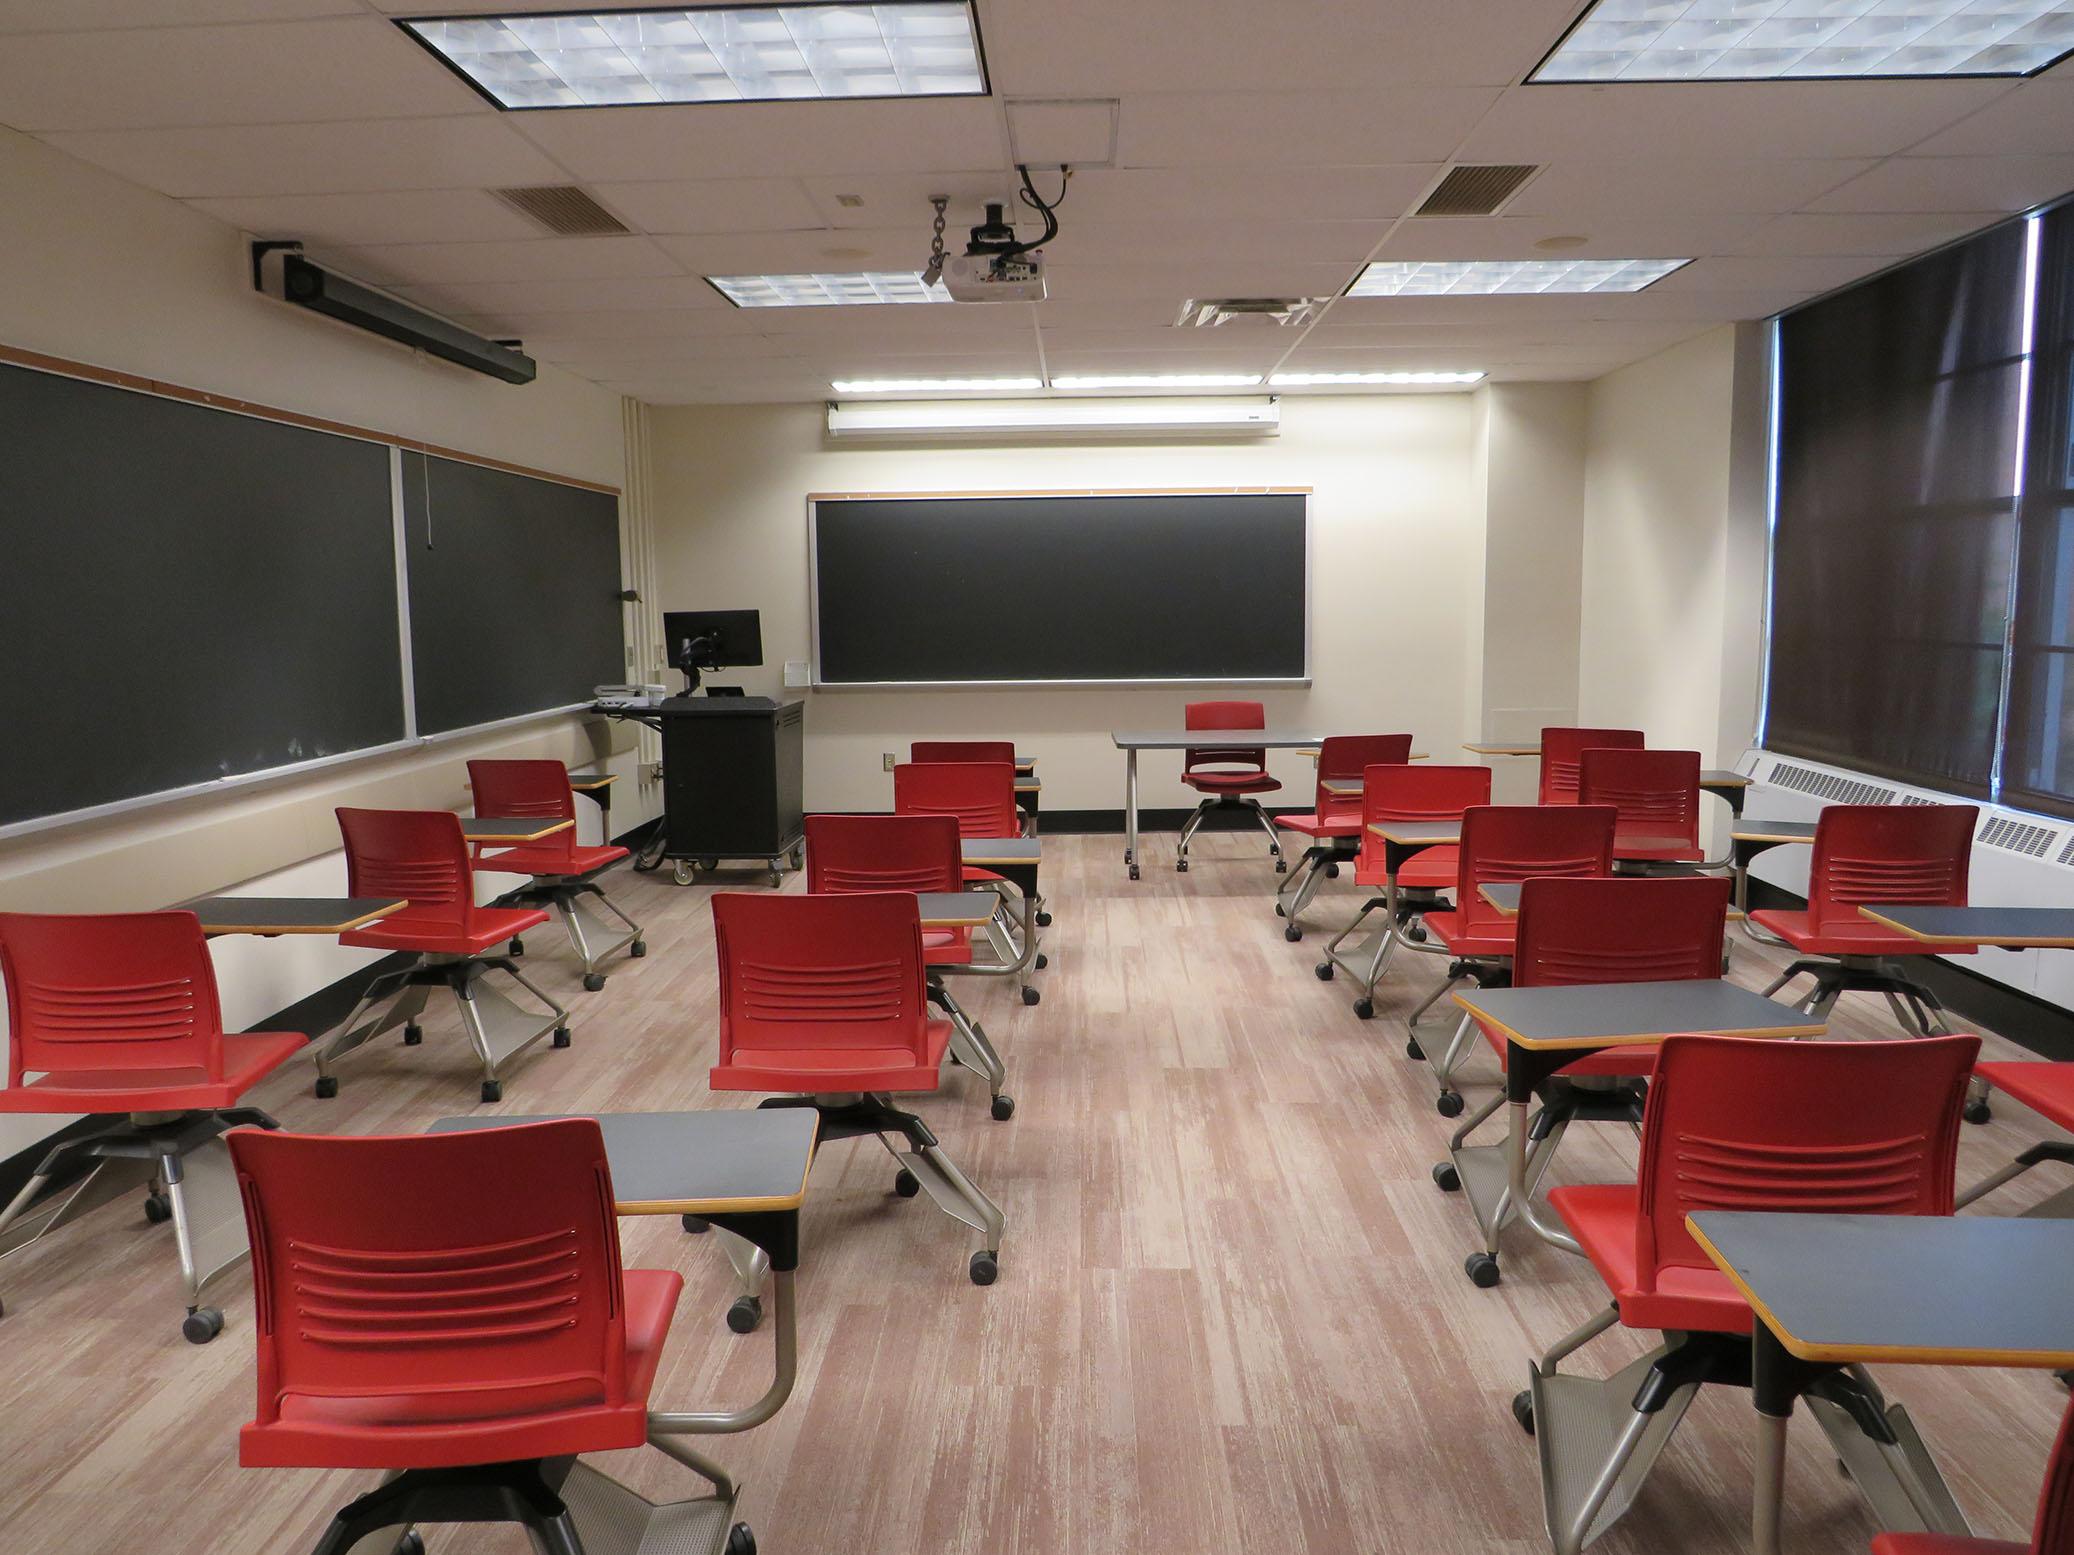 Denney Hall Room 202